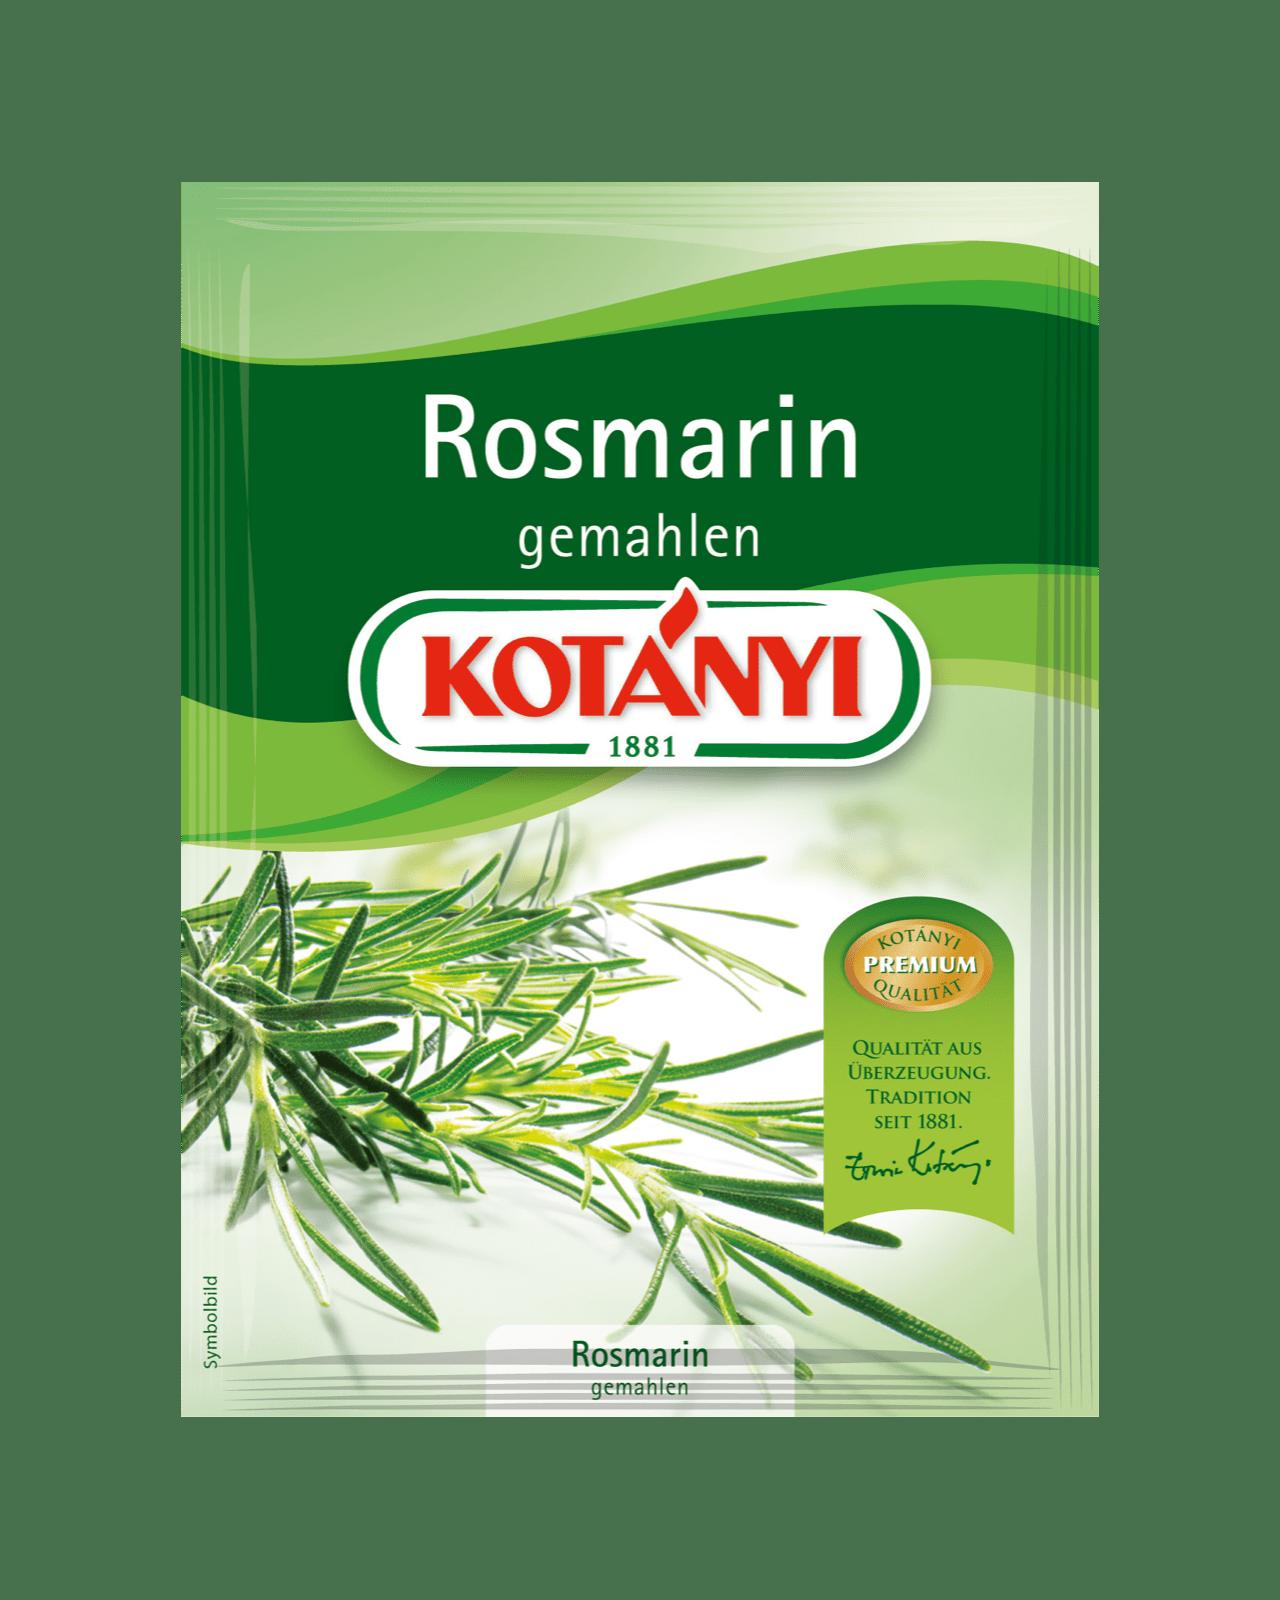 Kotányi Rosmarin gemahlen im Brief